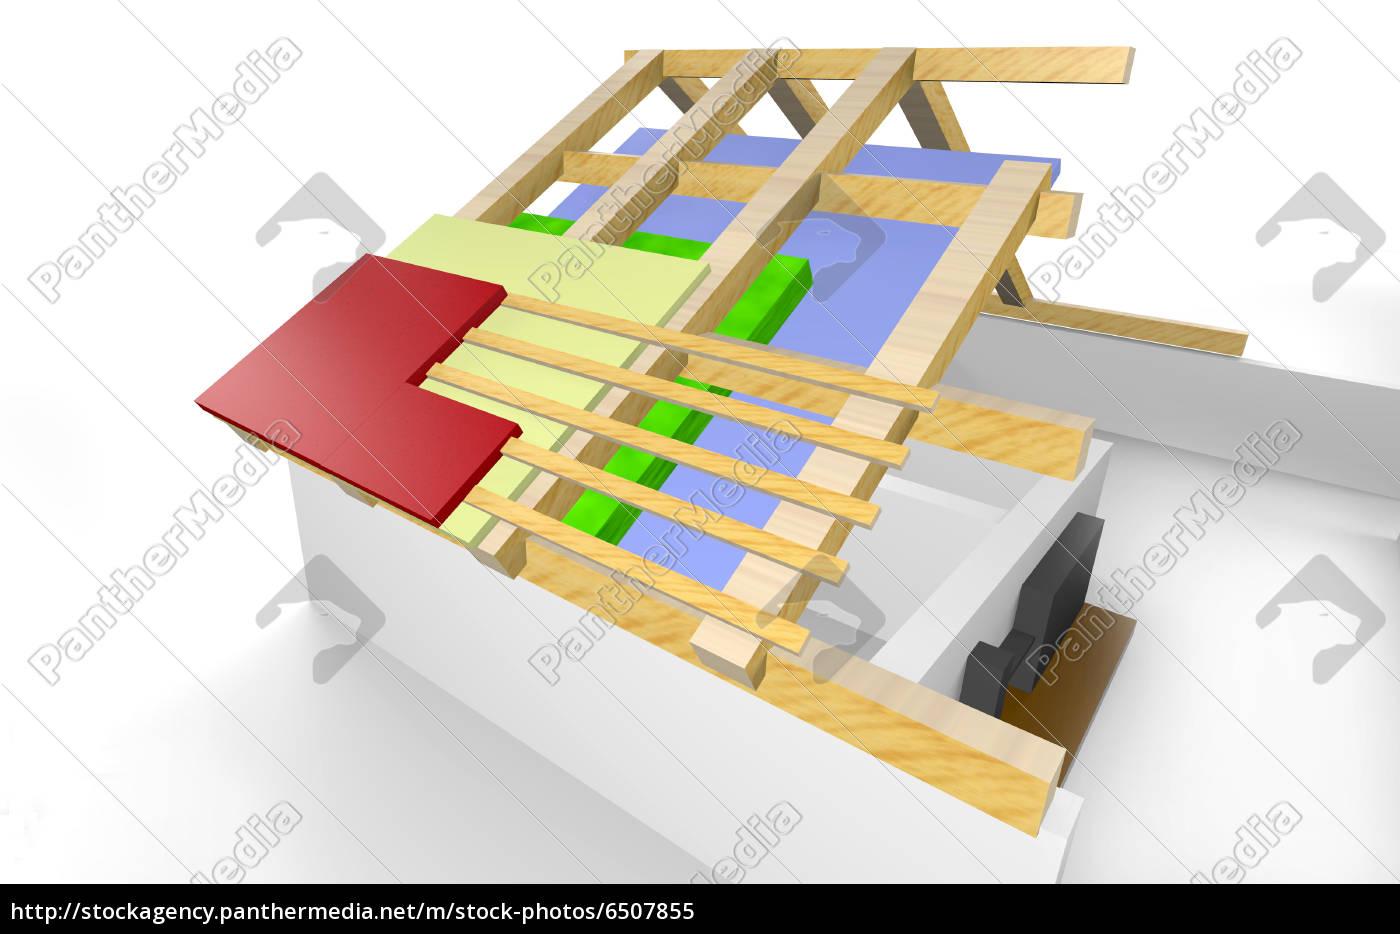 Stockfoto 6507855 - Dachkonstruktion Wärmedämmung beim Haus